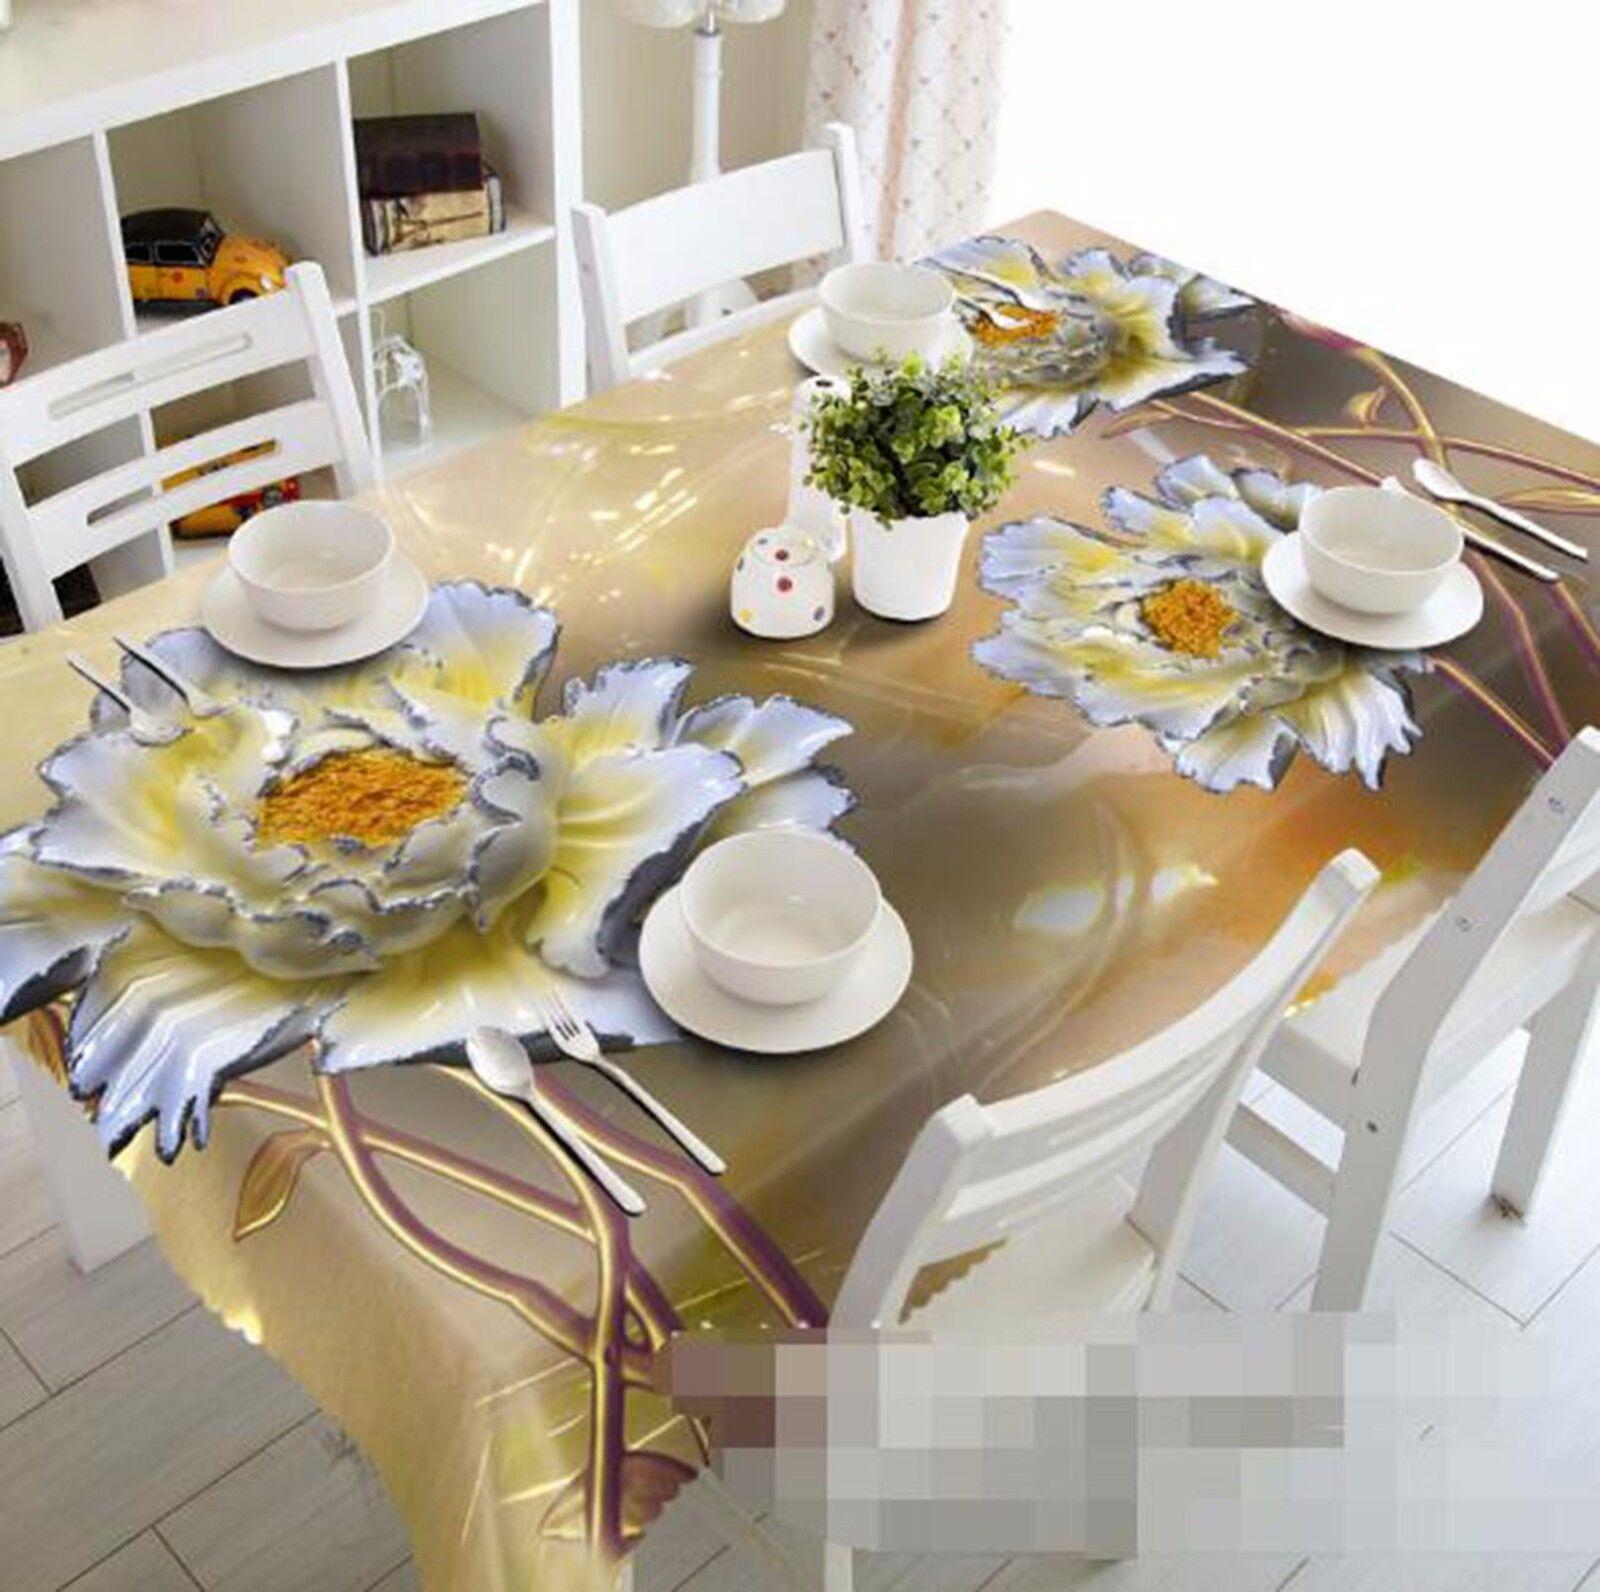 3D Petals 466 Tablecloth Table Cover Cloth Birthday Party AJ WALLPAPER UK Lemon